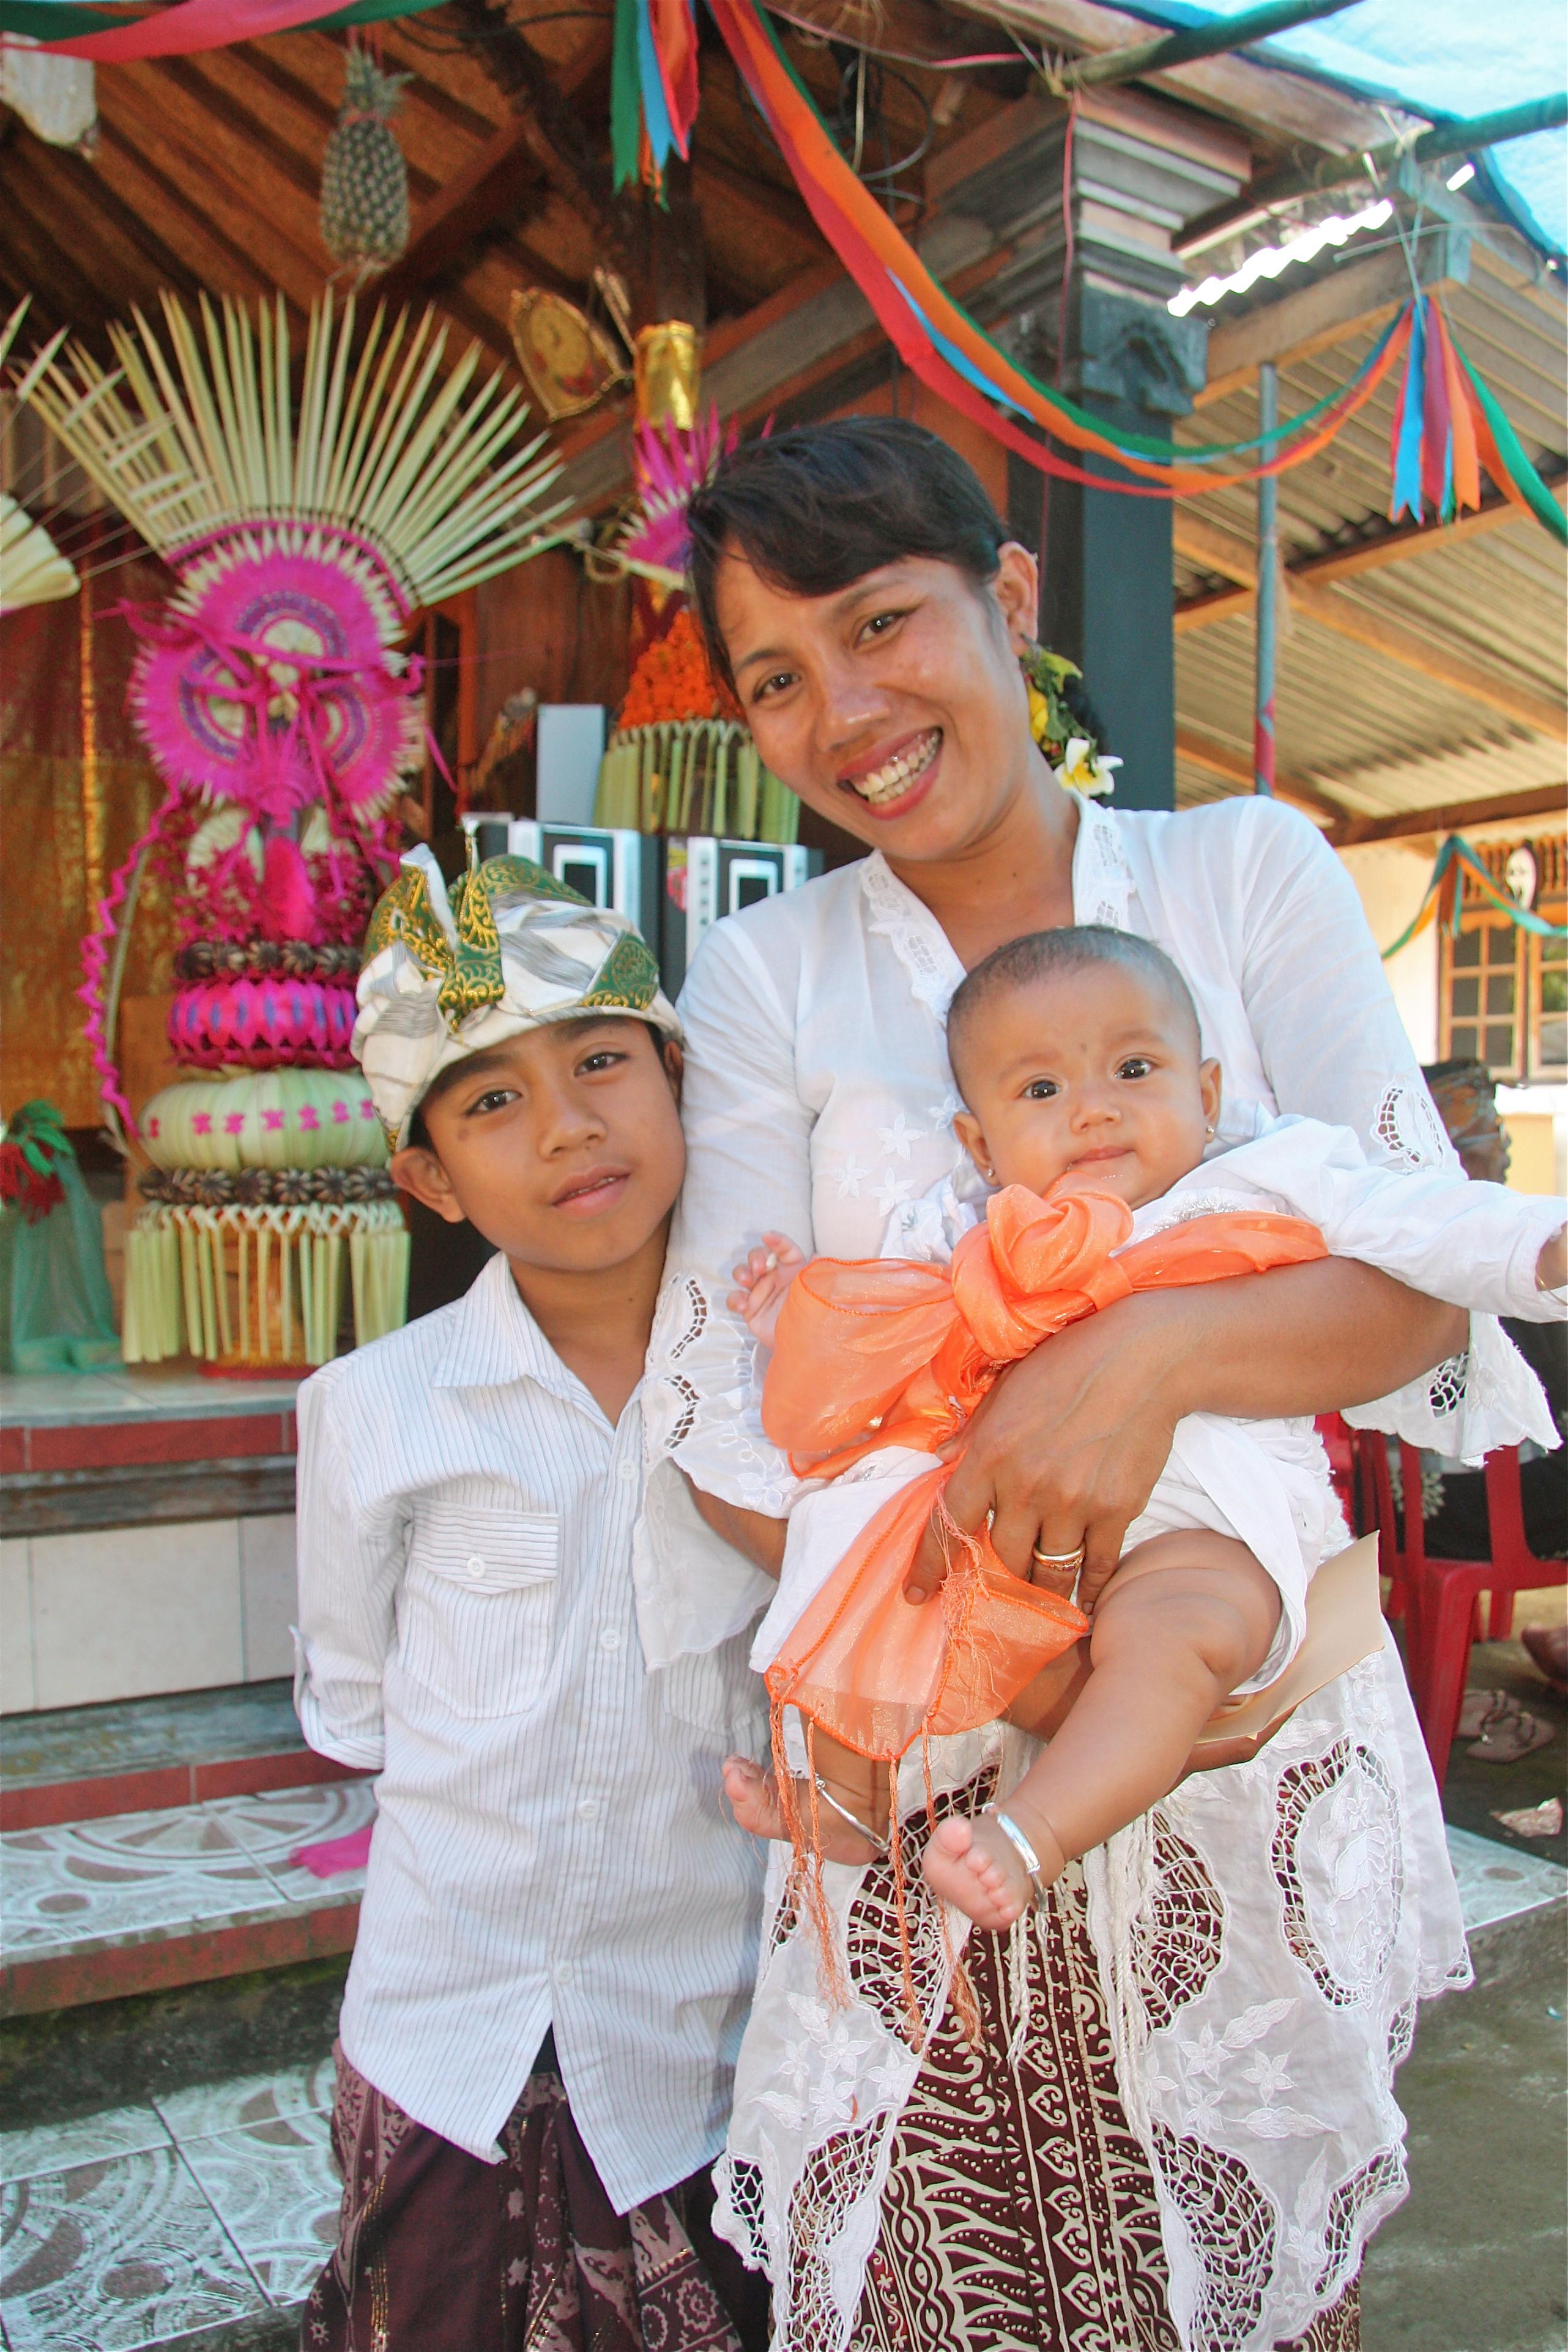 Meet local families